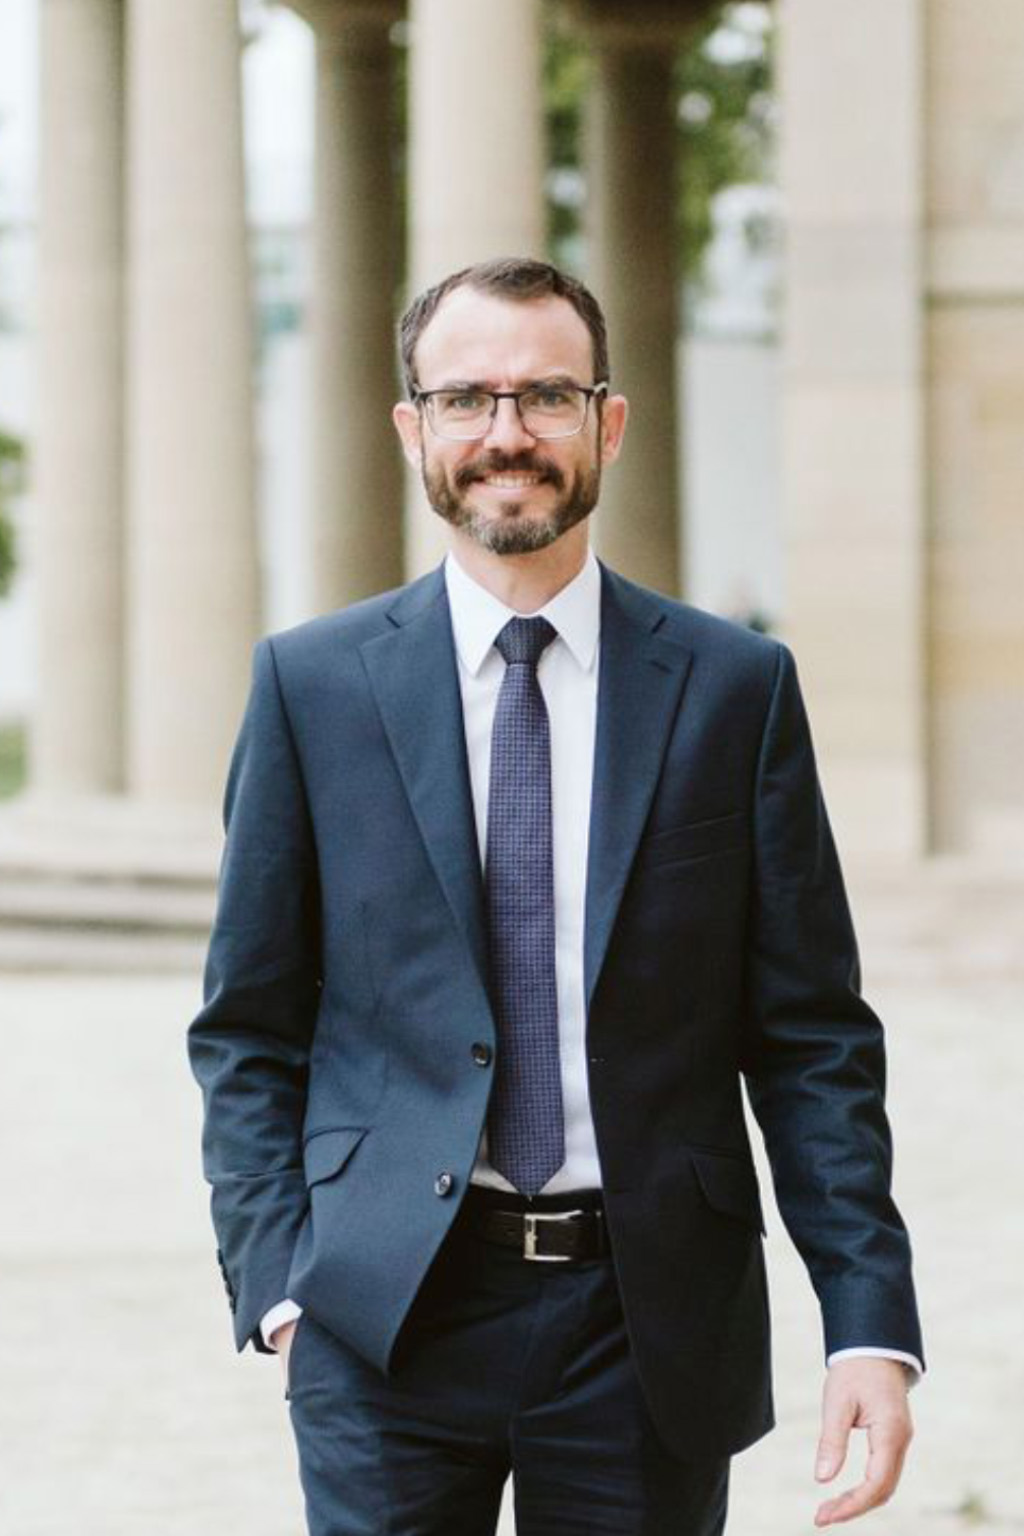 Herr Rechtsanwalt Schaupp - Anwalt für Erbrecht, Handels- und Gesellschaftsrecht und Immobilienrecht